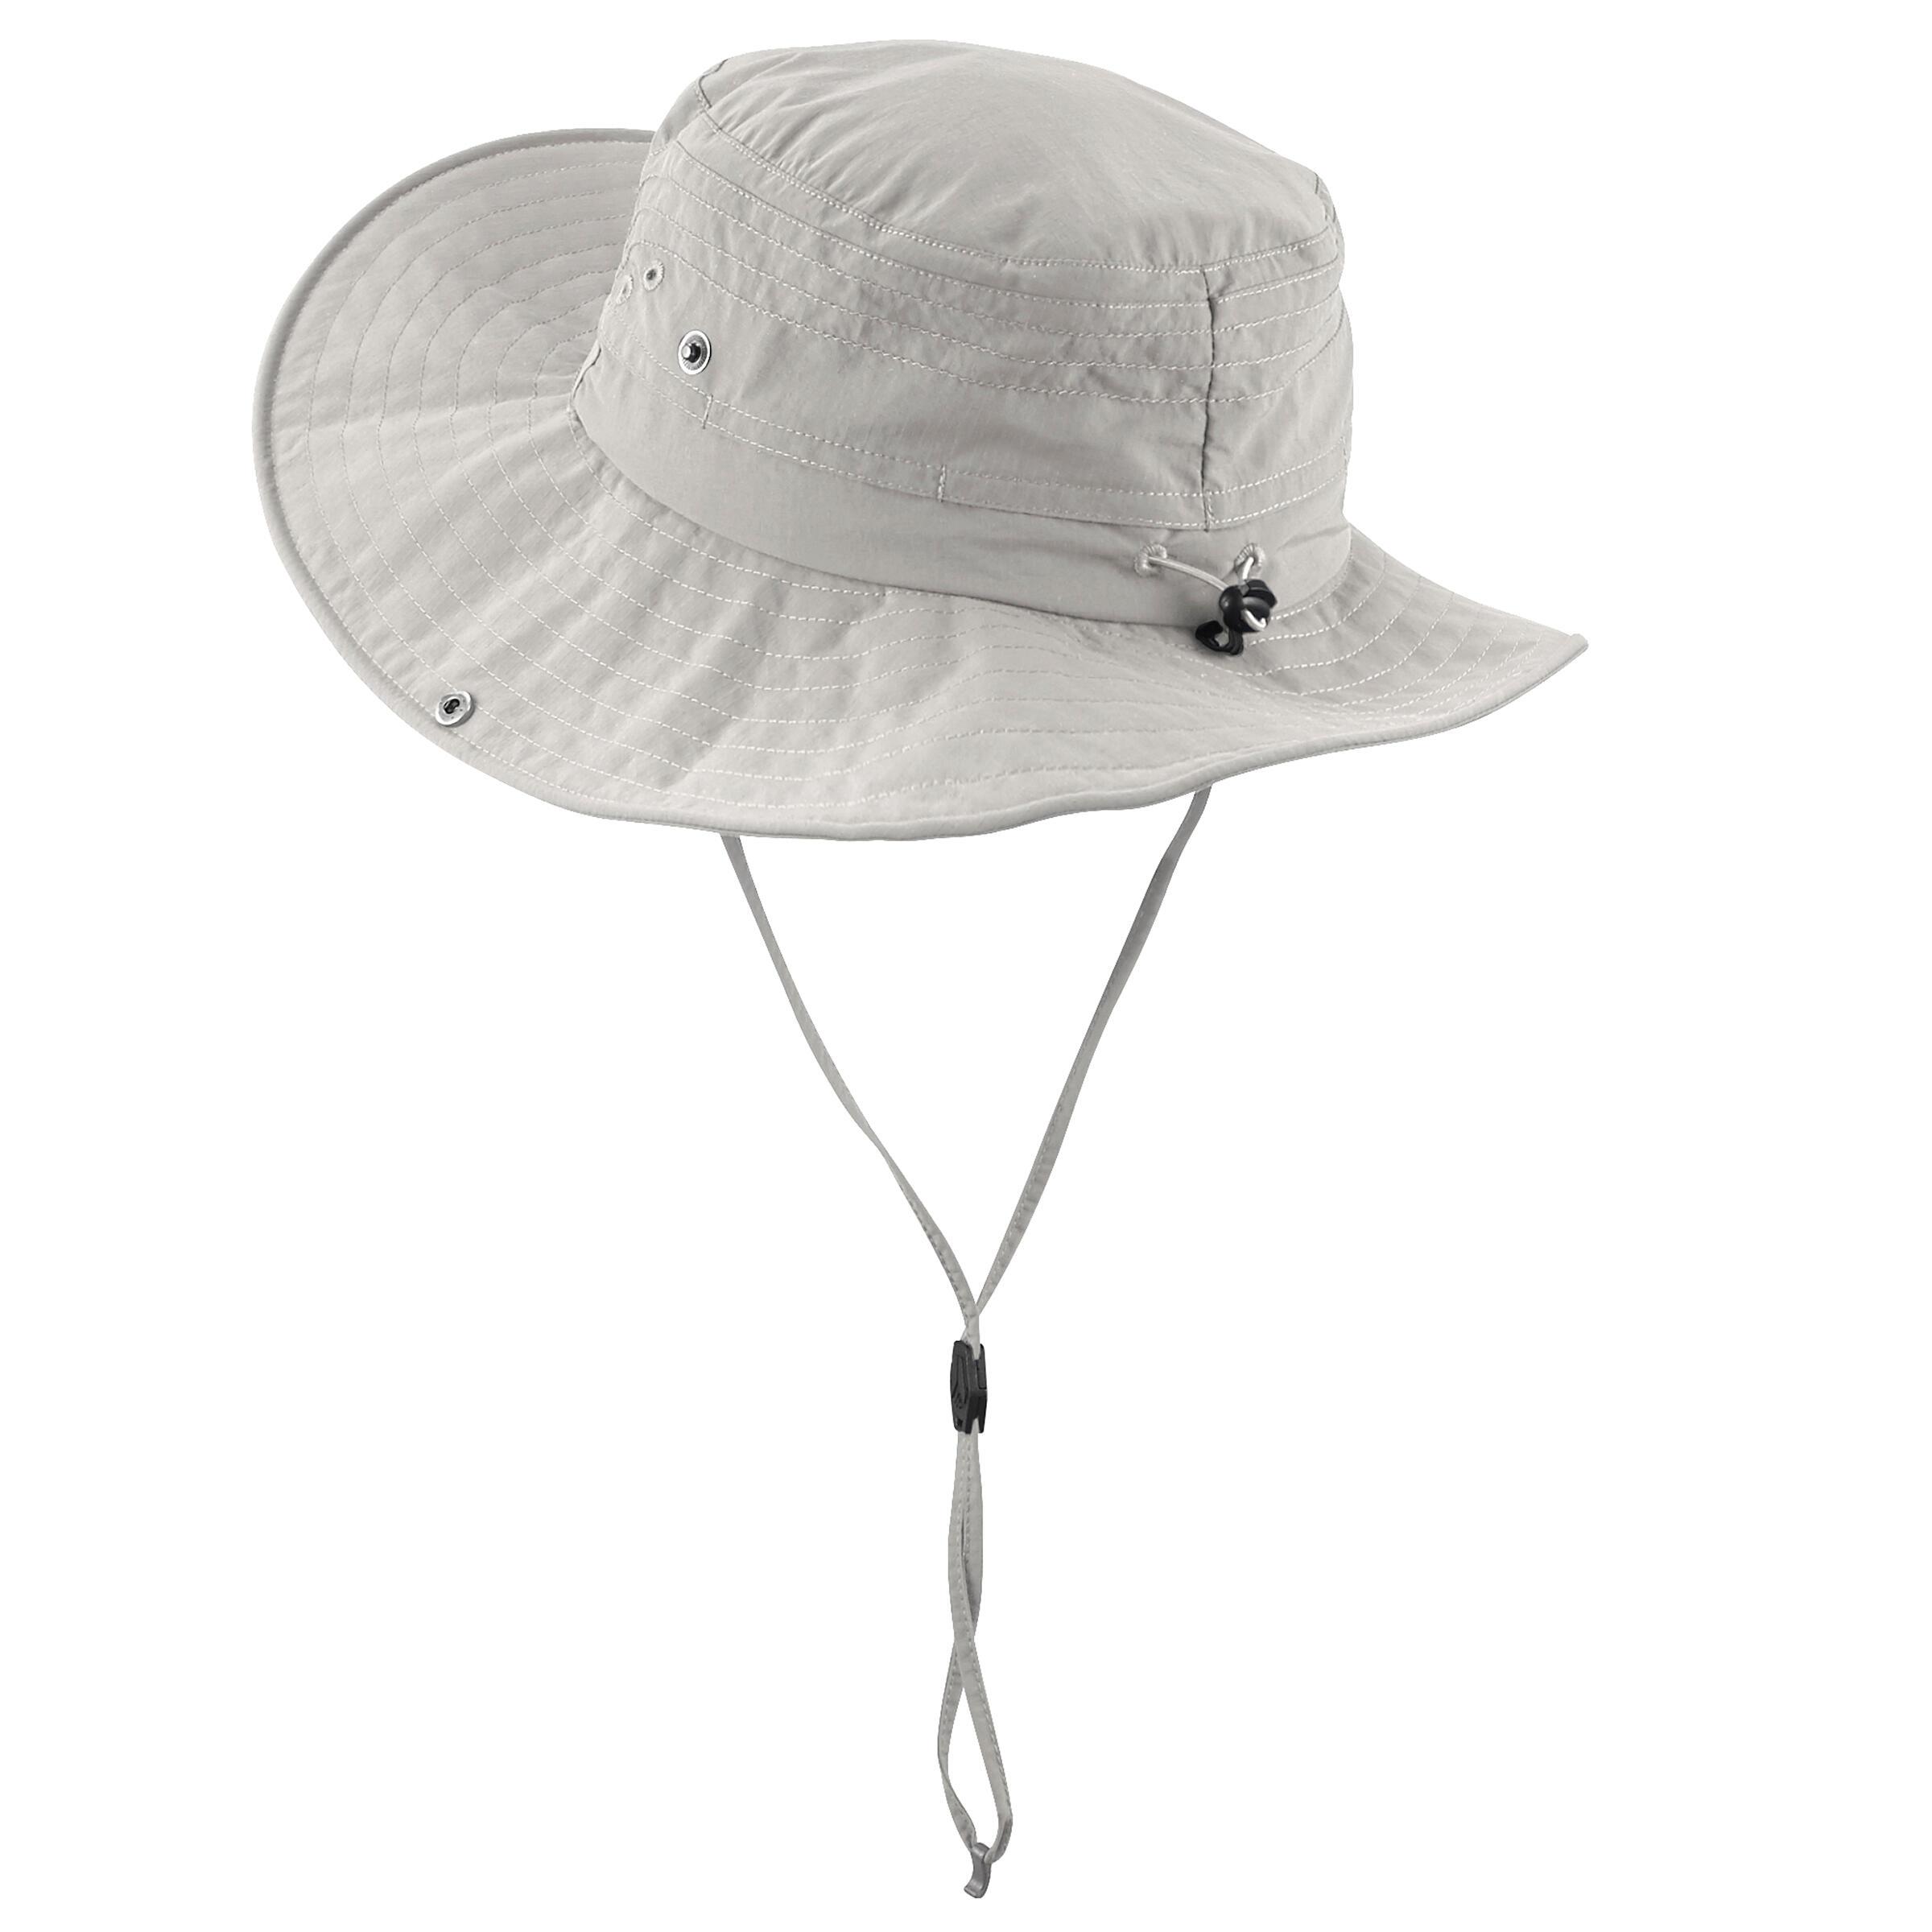 Trek 500 Anti-UV Mountain Trekking Hat - Beige